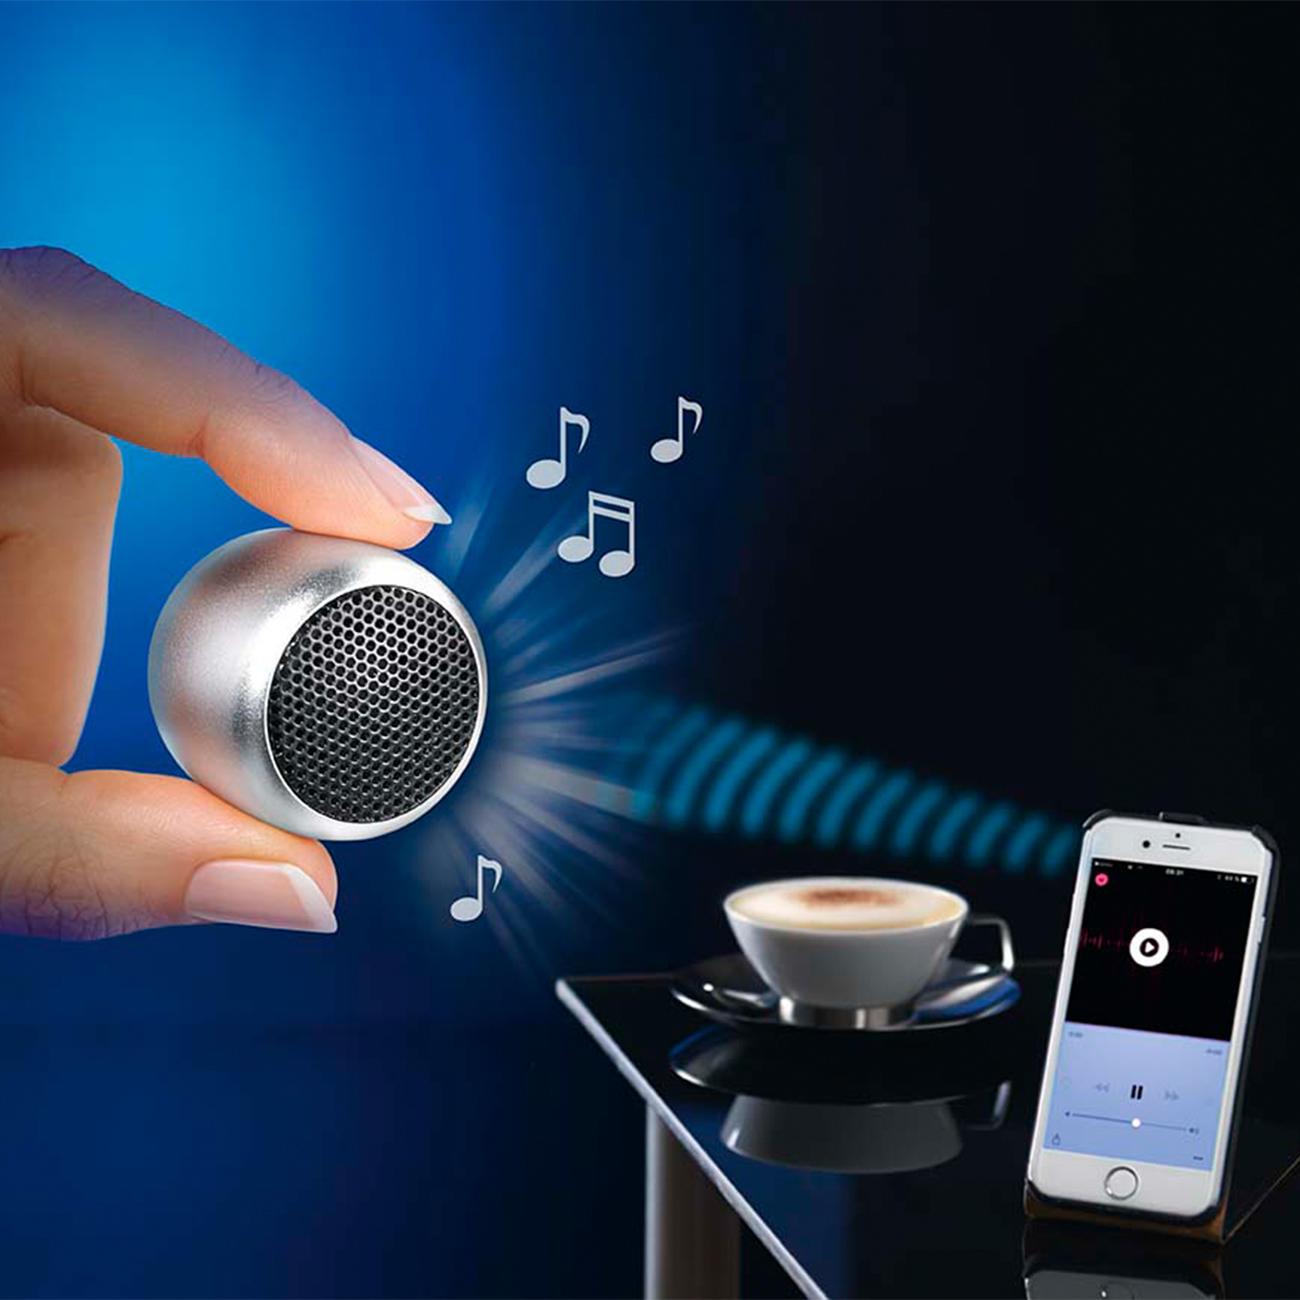 mini bluetooth lautsprecher mini speaker silber 3 4 x 2 5 cm durchmesser x h. Black Bedroom Furniture Sets. Home Design Ideas